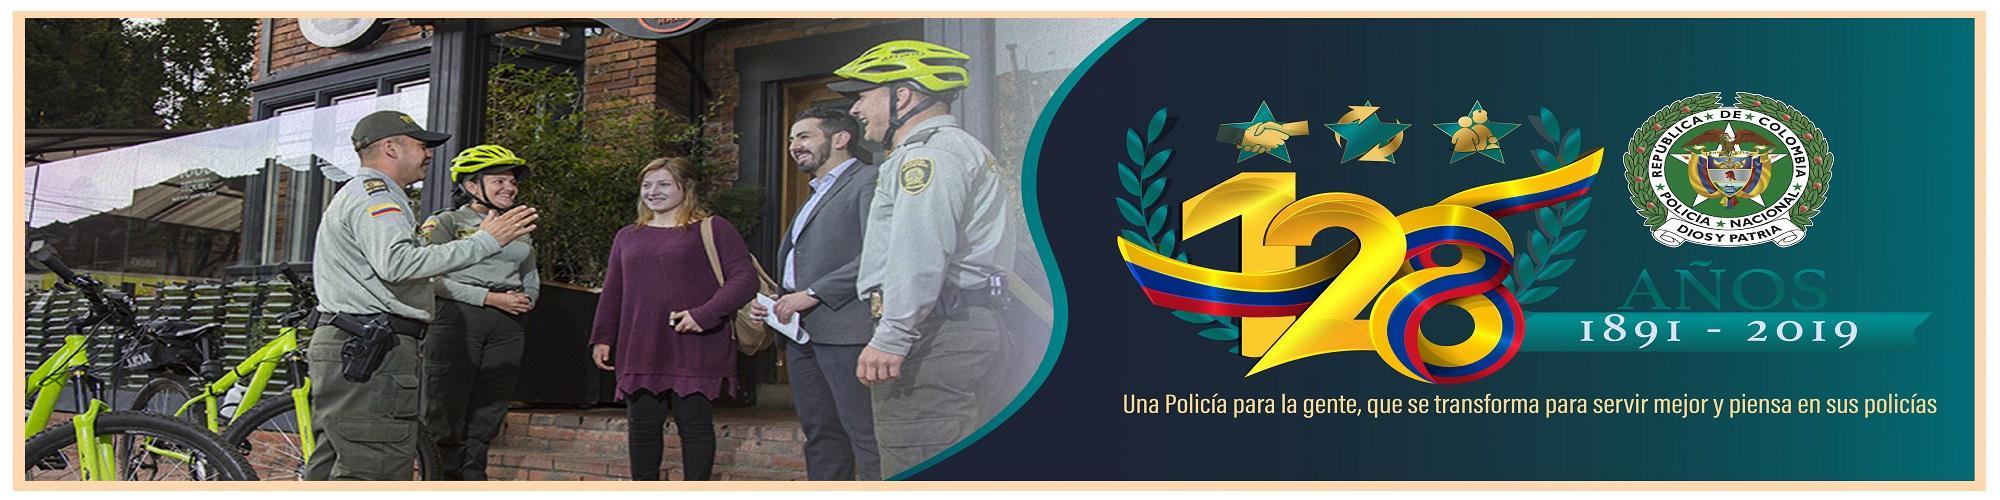 Aniversario-Policía-Nacional